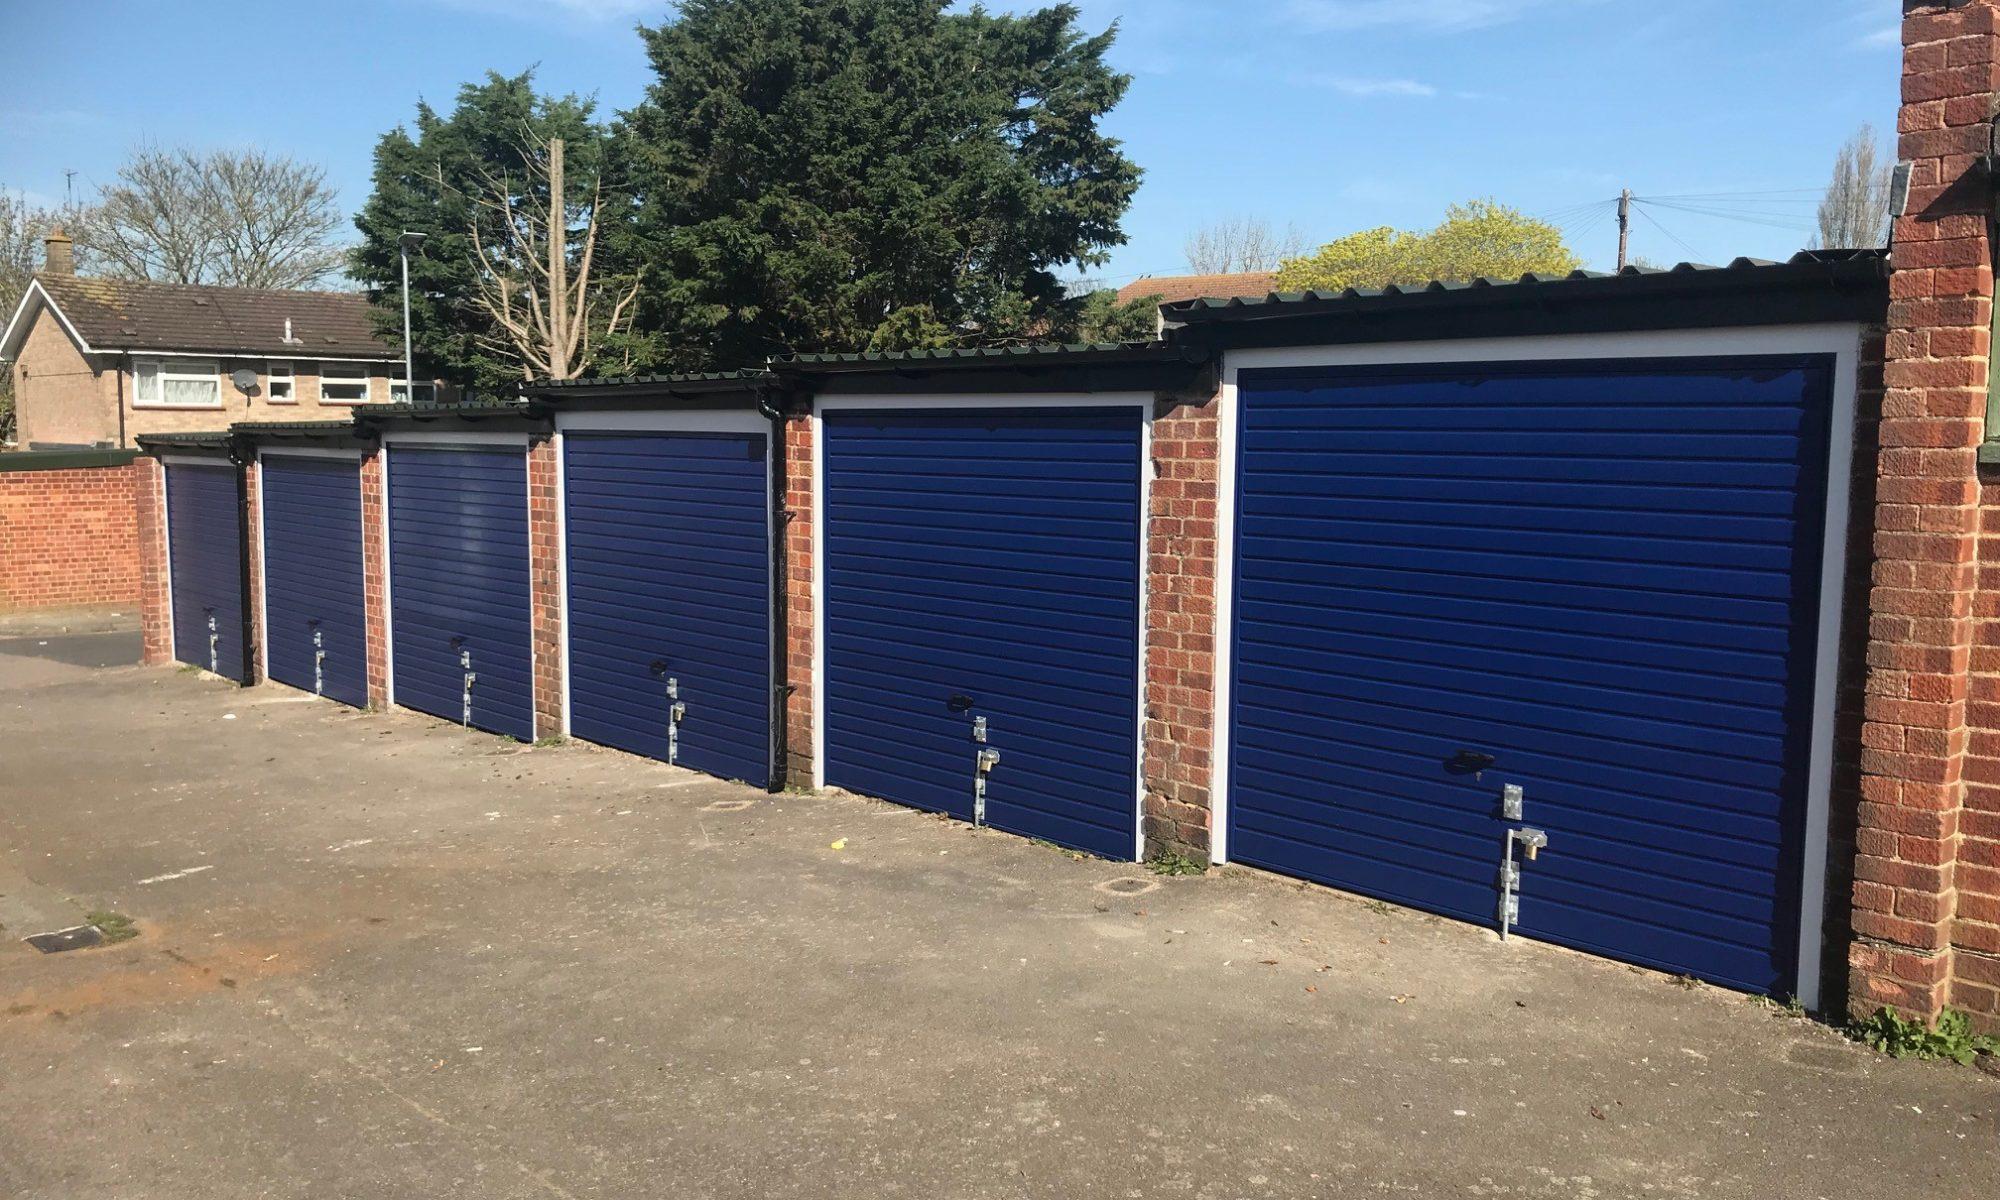 Garages in Watford to rent newly refurbished garages Watford image 1